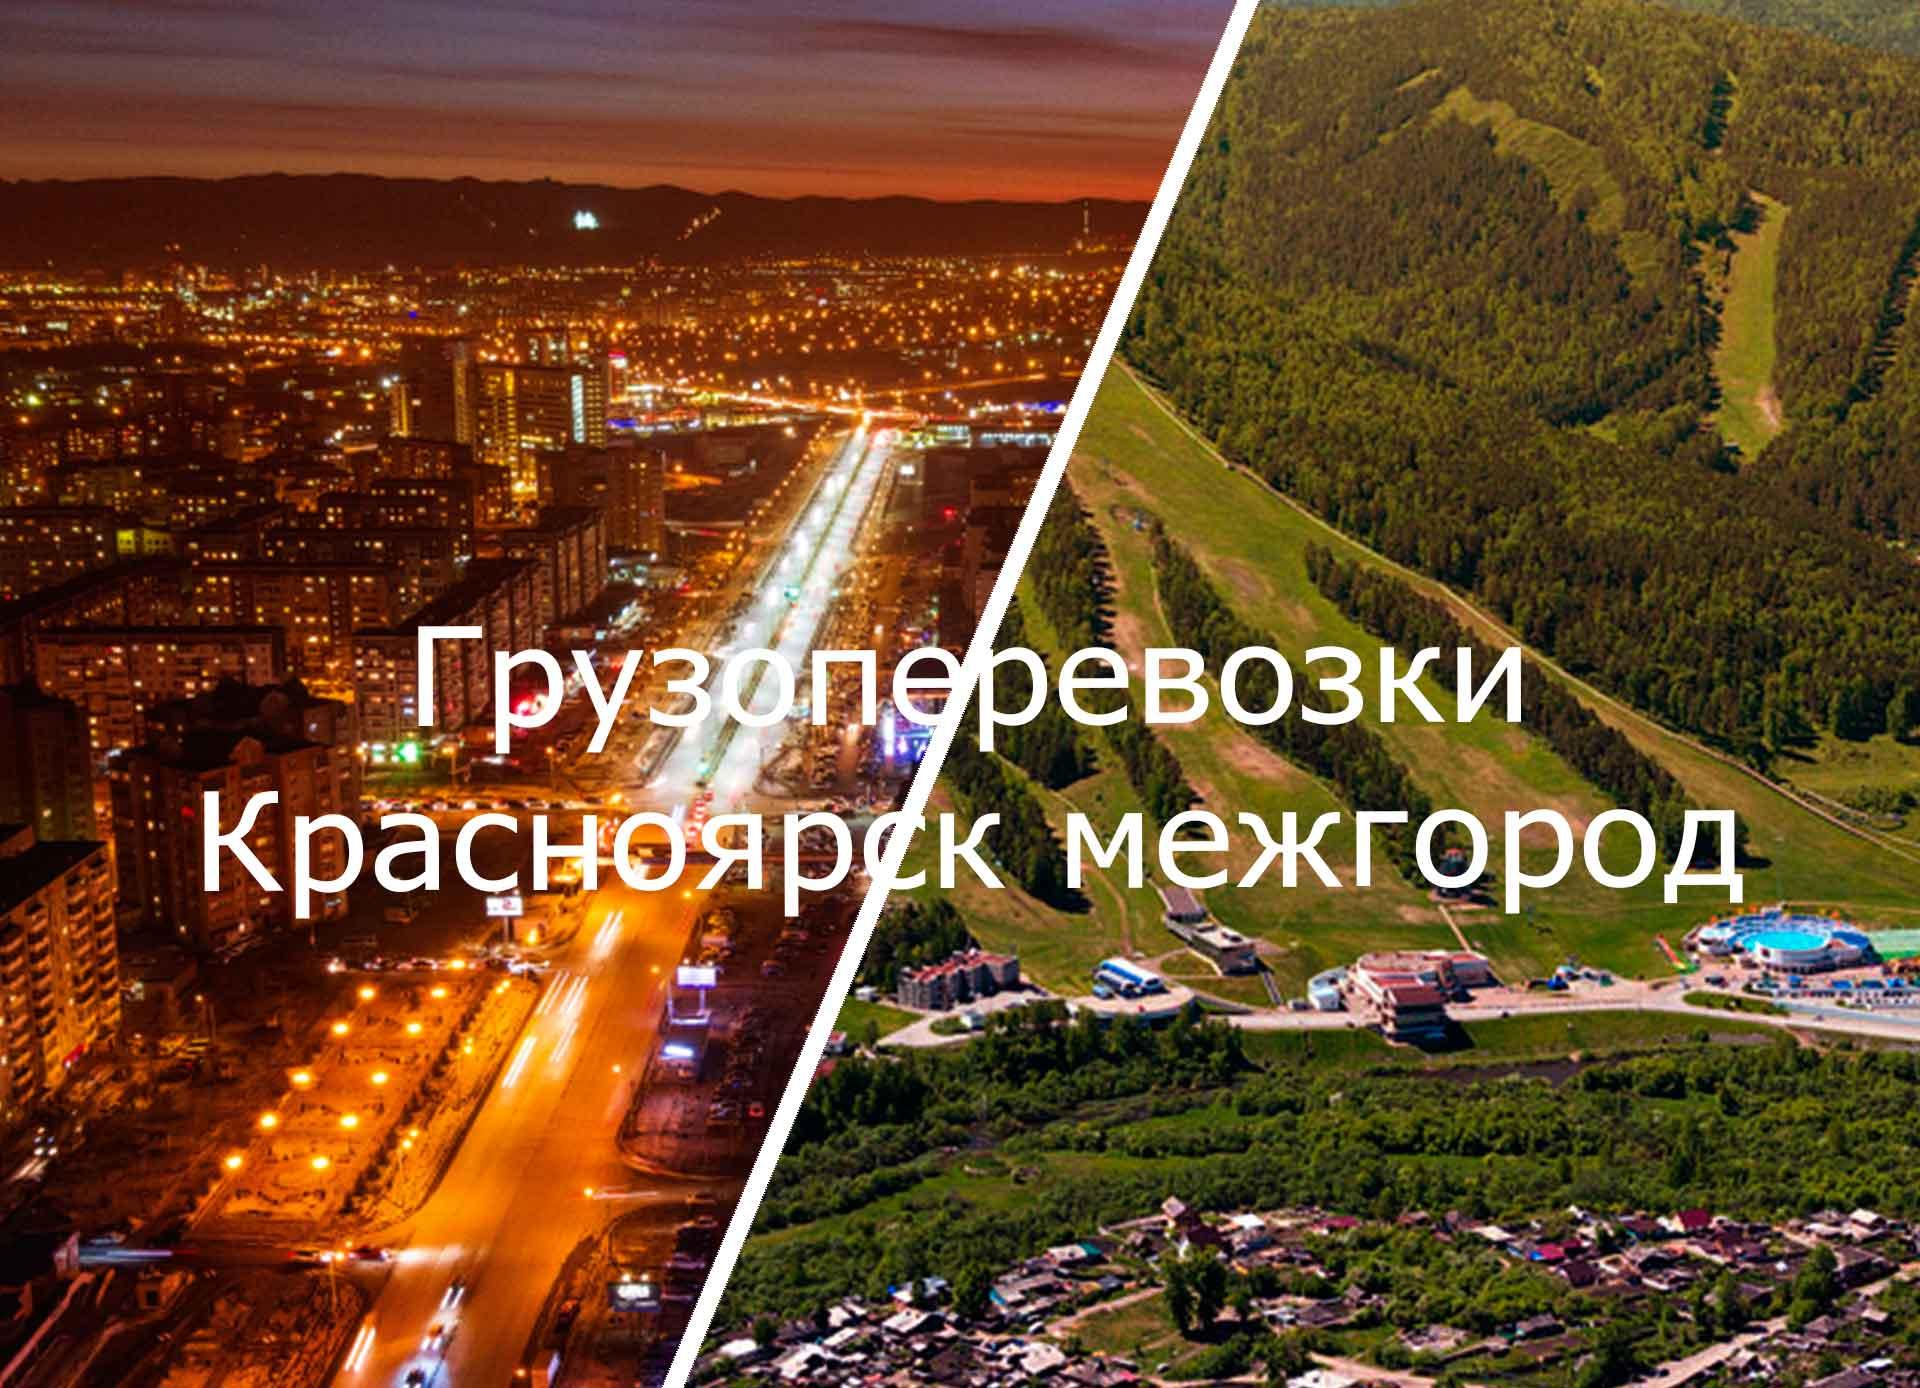 грузоперевозки красноярск межгород